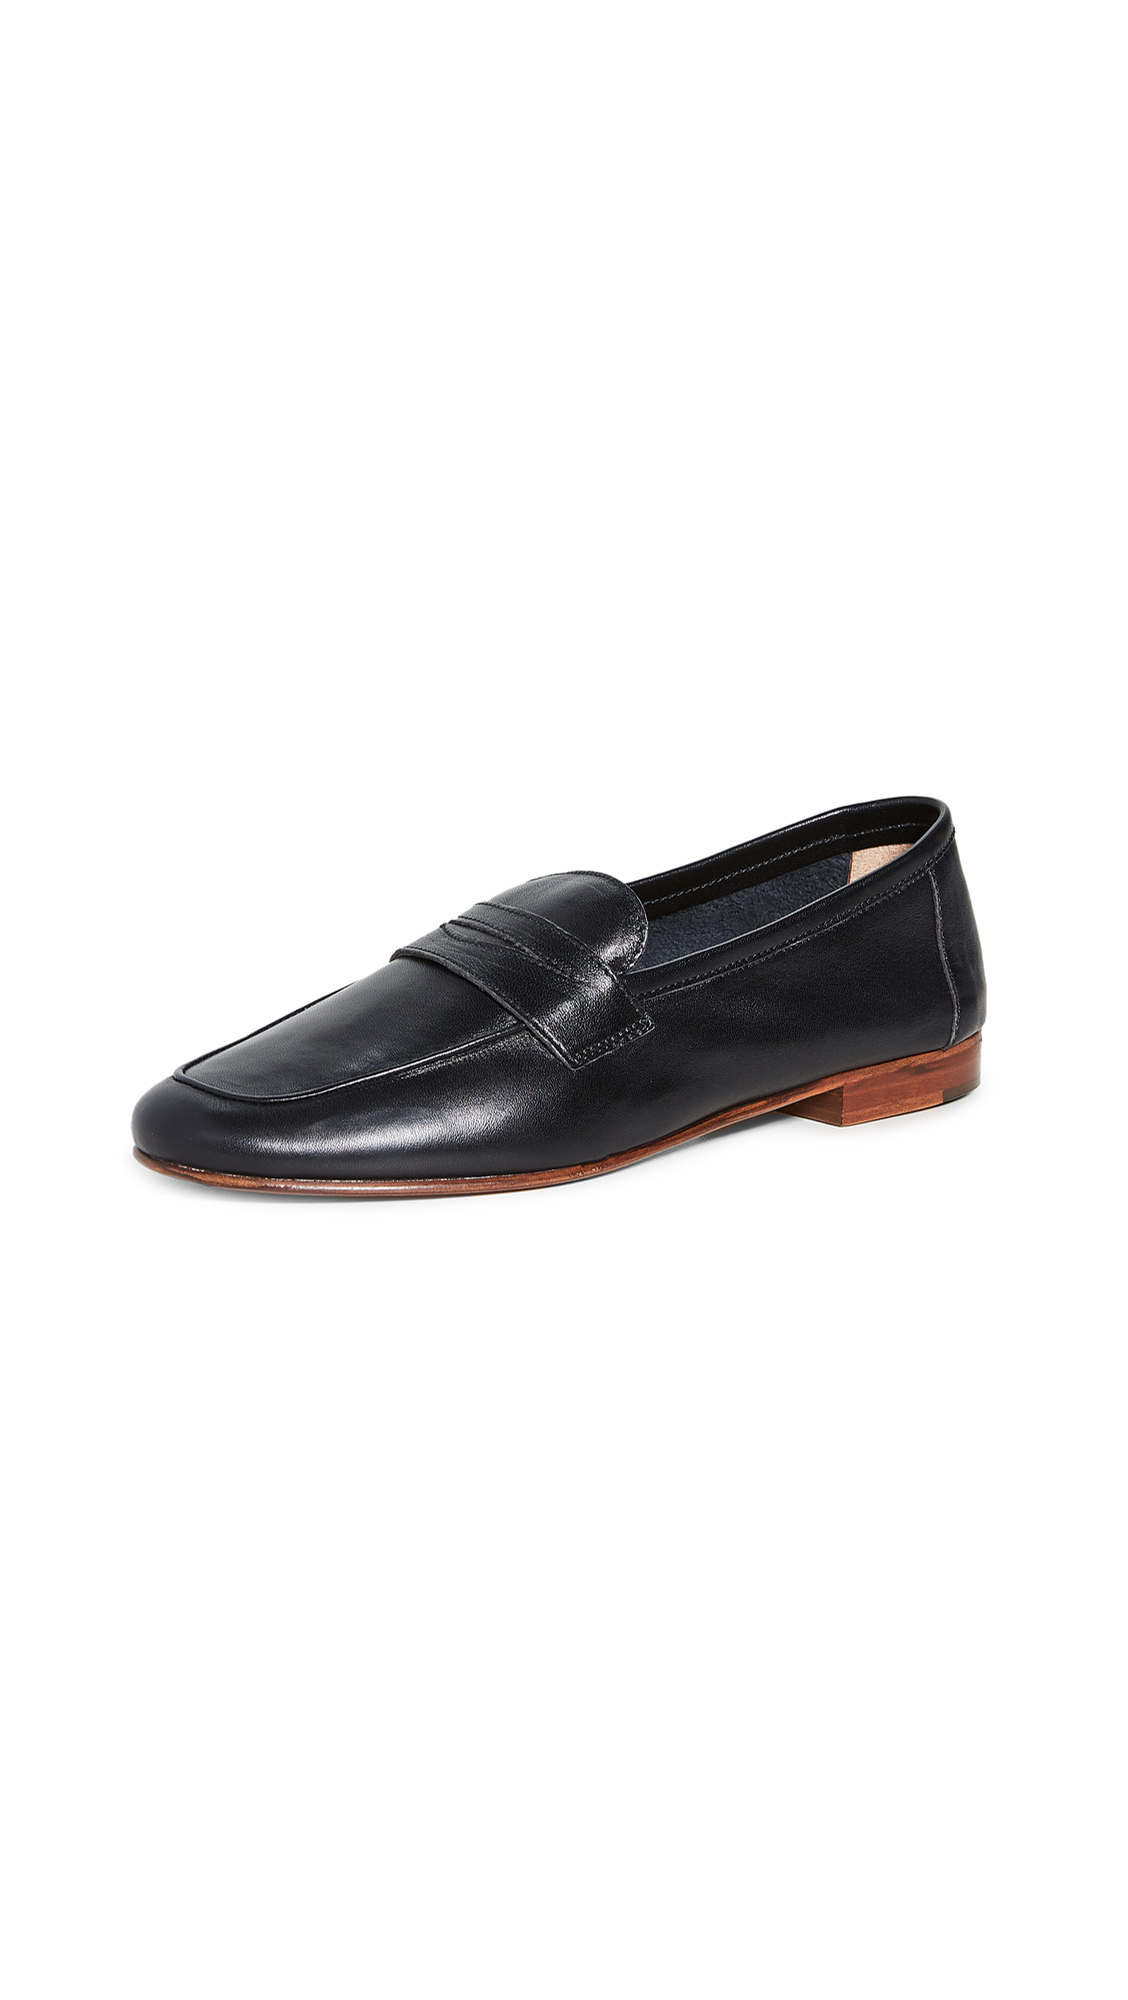 Buy Mansur Gavriel Classic Loafers online, shop Mansur Gavriel